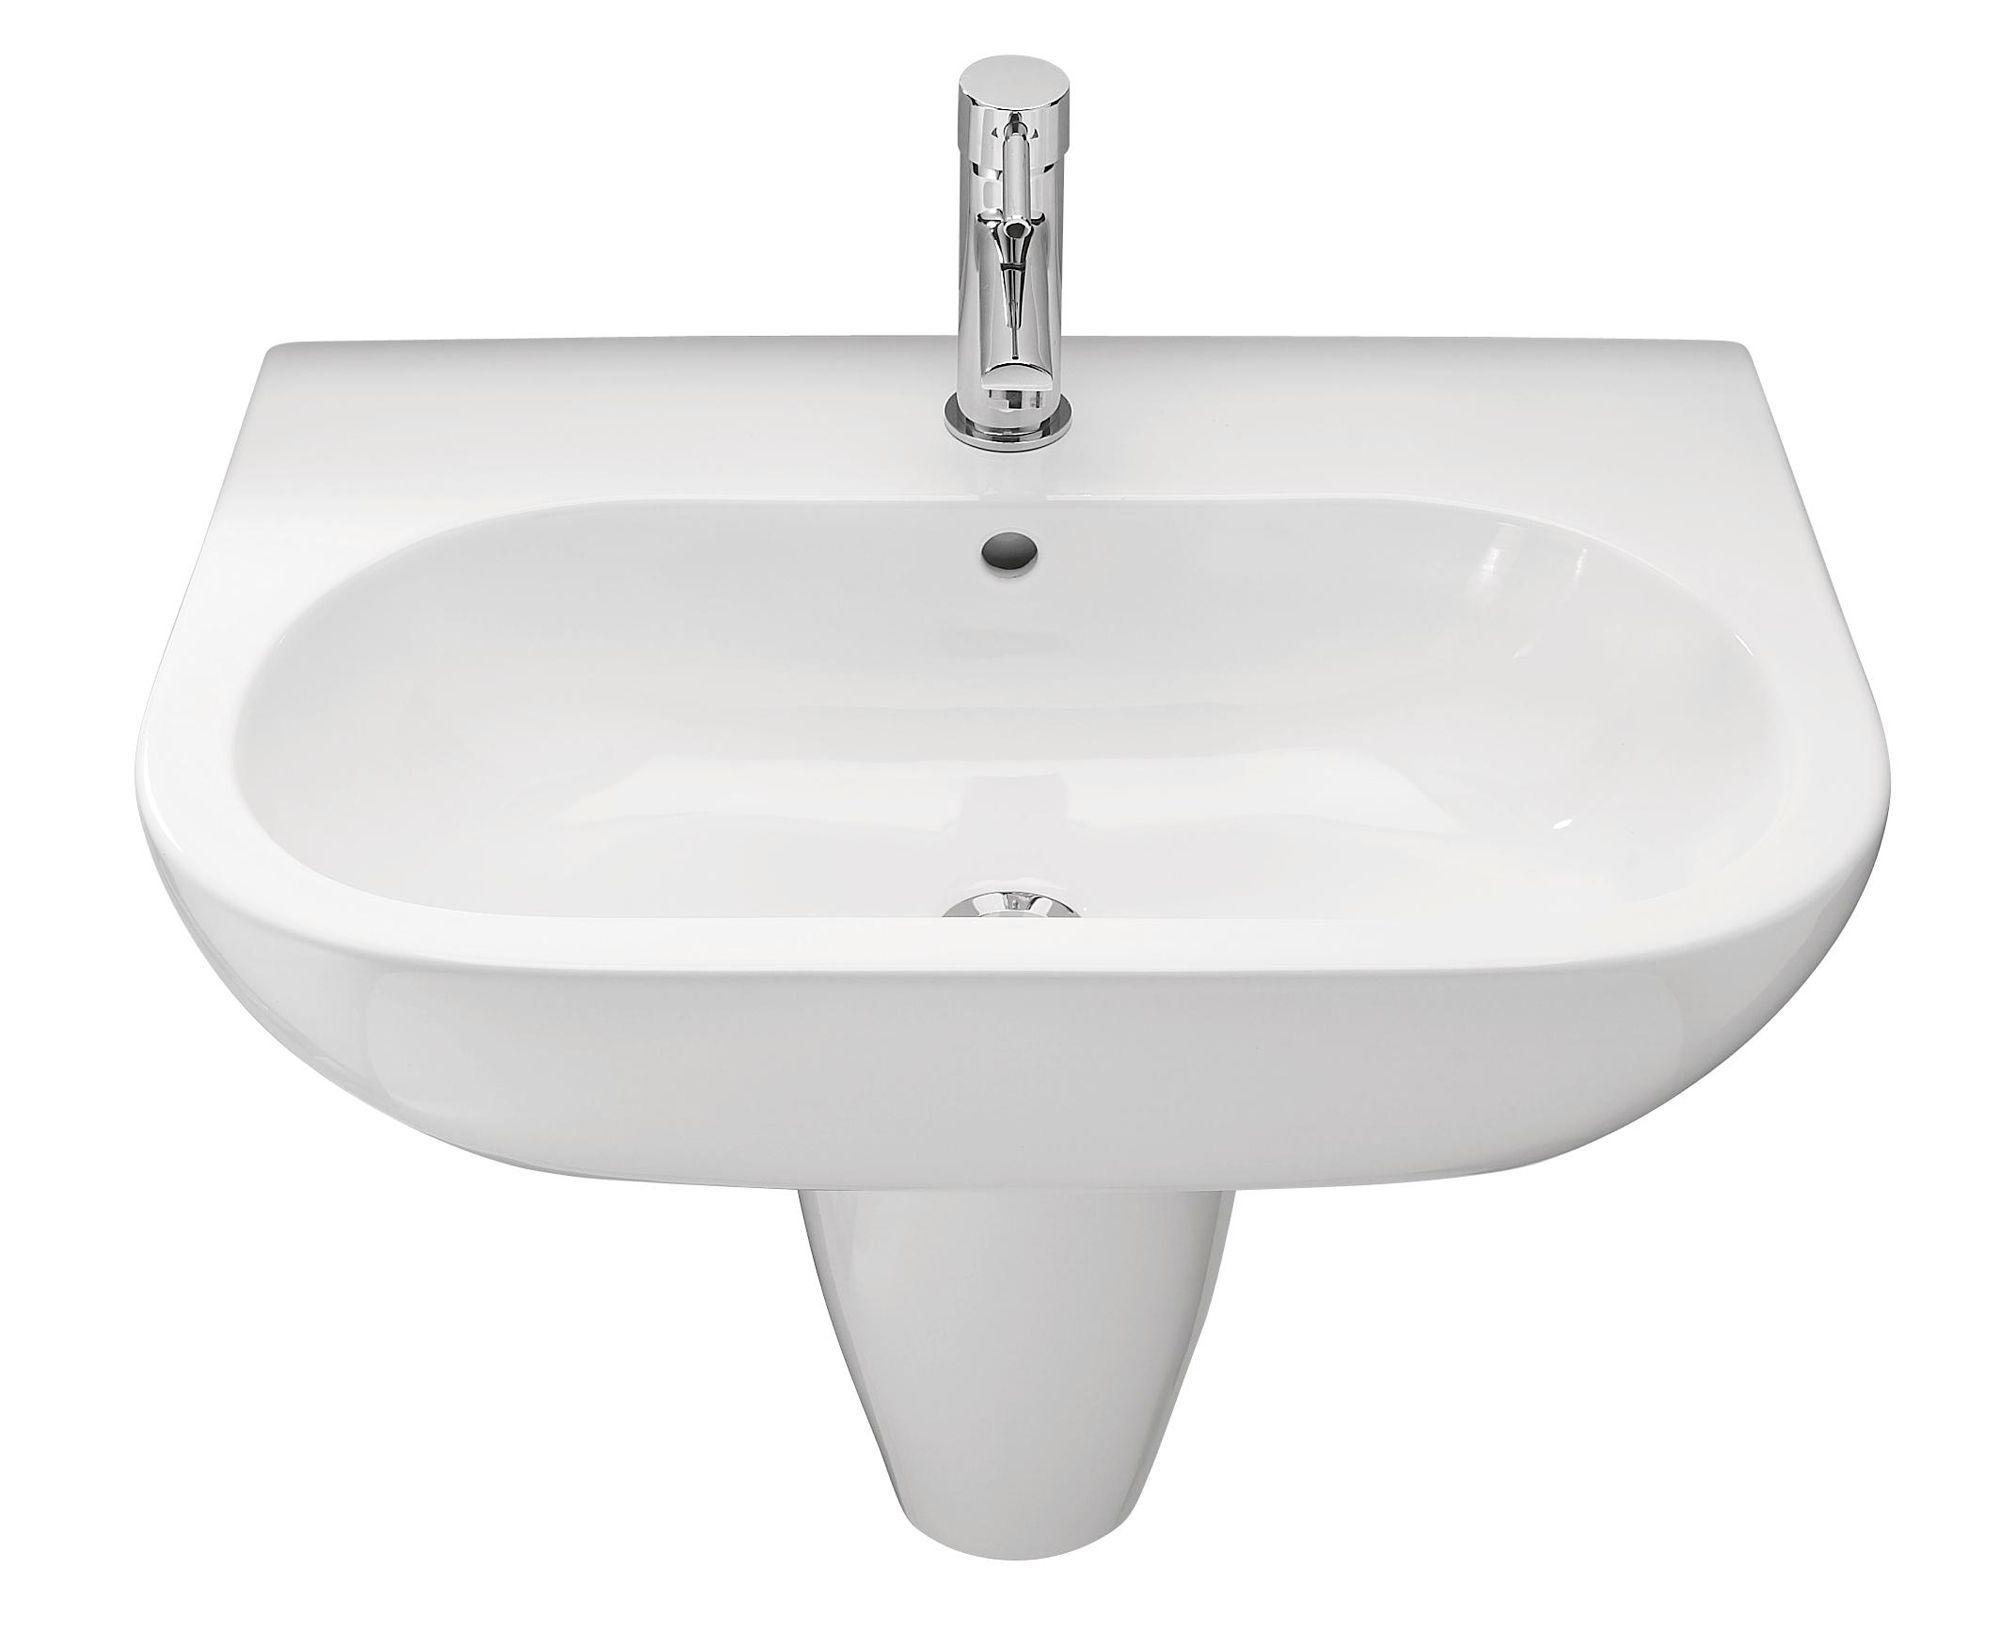 Bathroom Sinks B&Q Ireland cooke & lewis helena semi pedestal basin | departments | diy at b&q